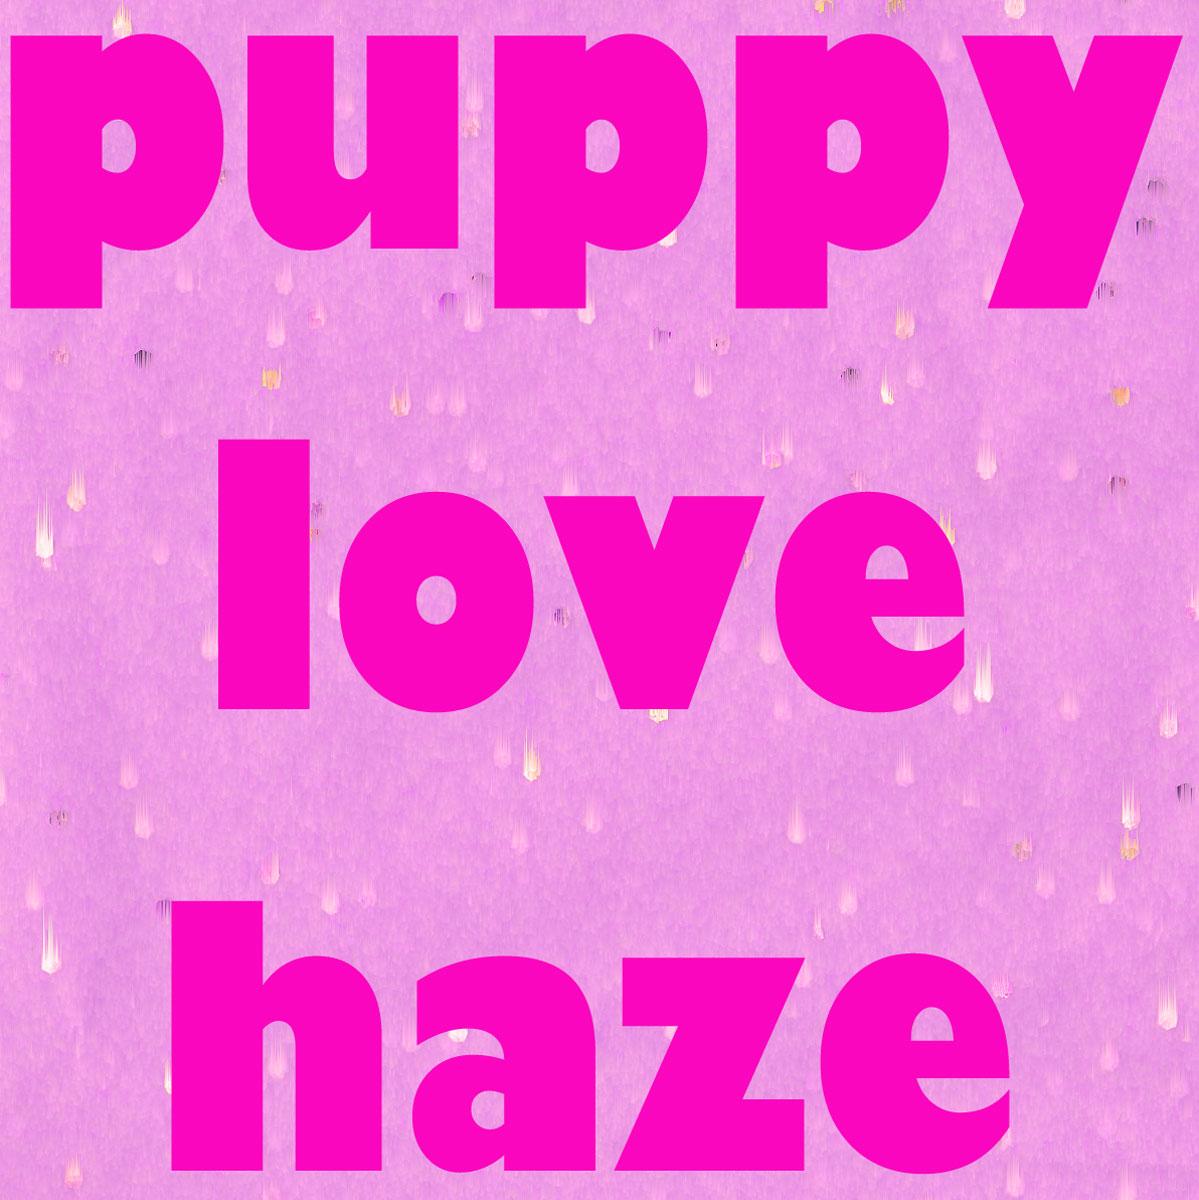 puppy_love_hazeWP